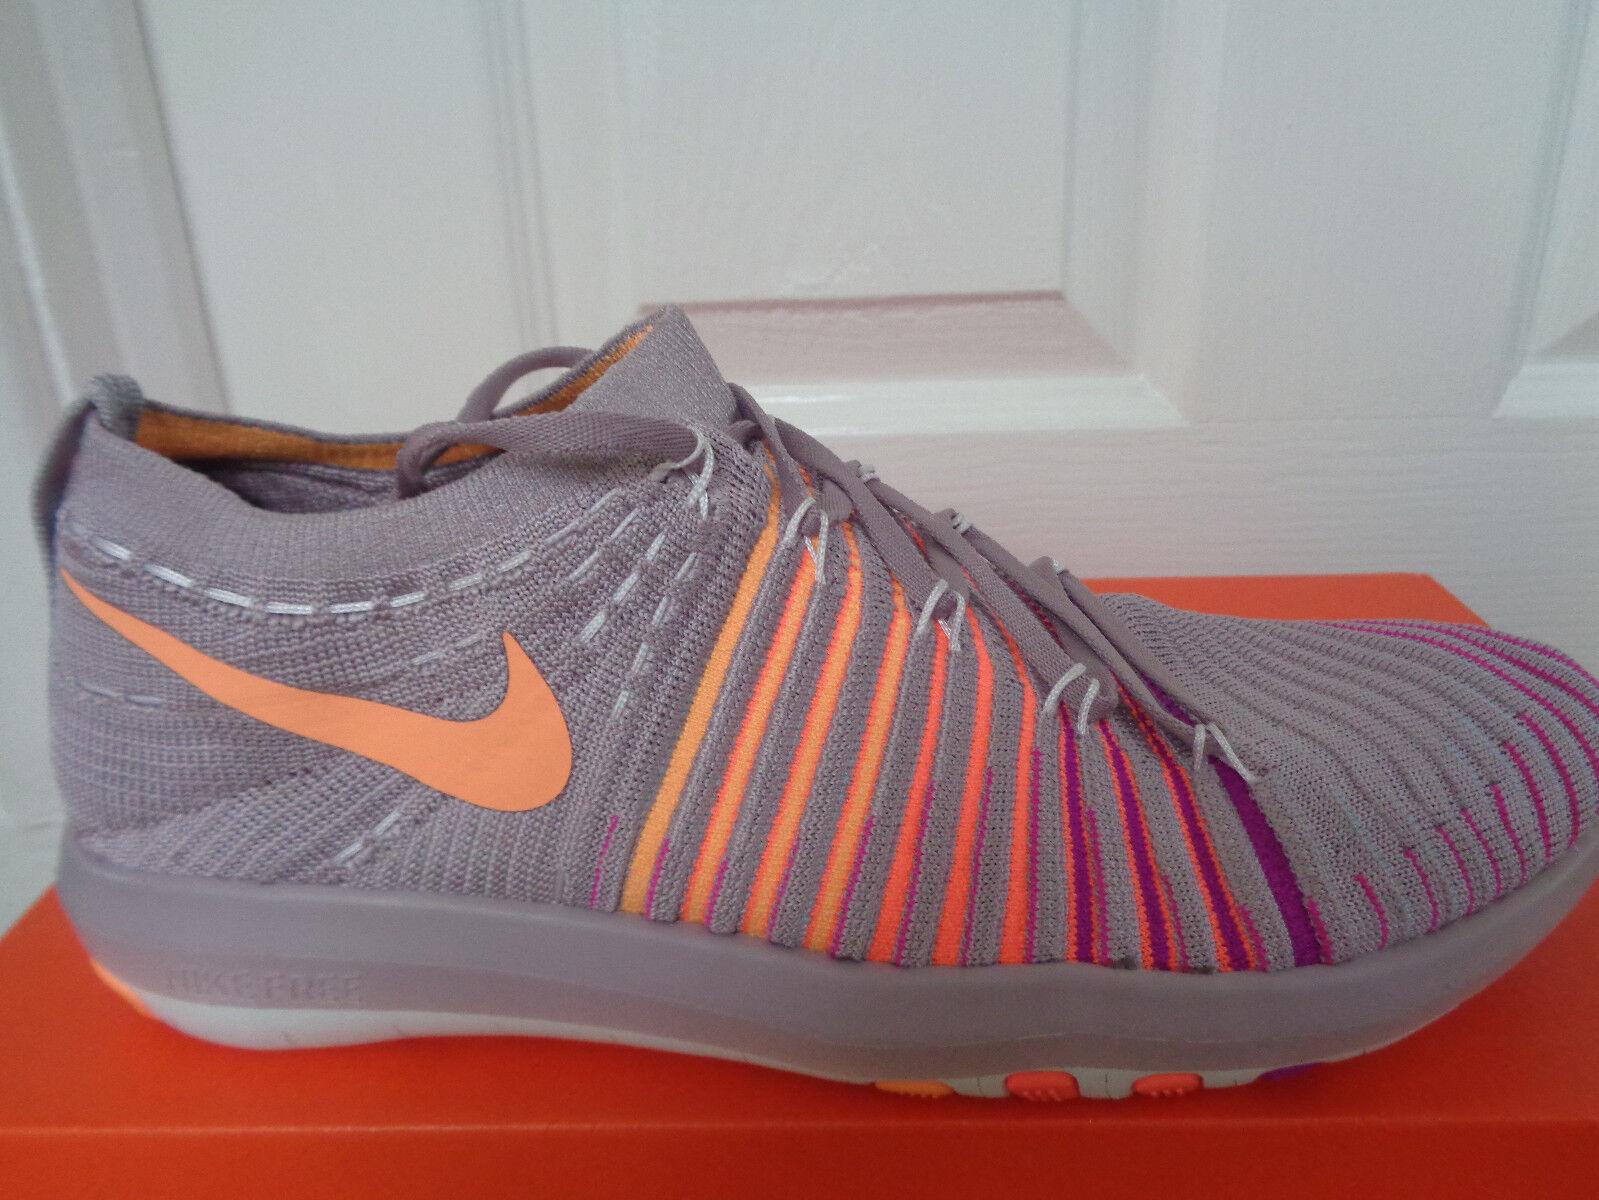 Nike Free Transformer Flyknit Baskets Chaussures 833410 502 UK UK UK 6 EU 40 US 8.5 Neuf + Boîte b503cb